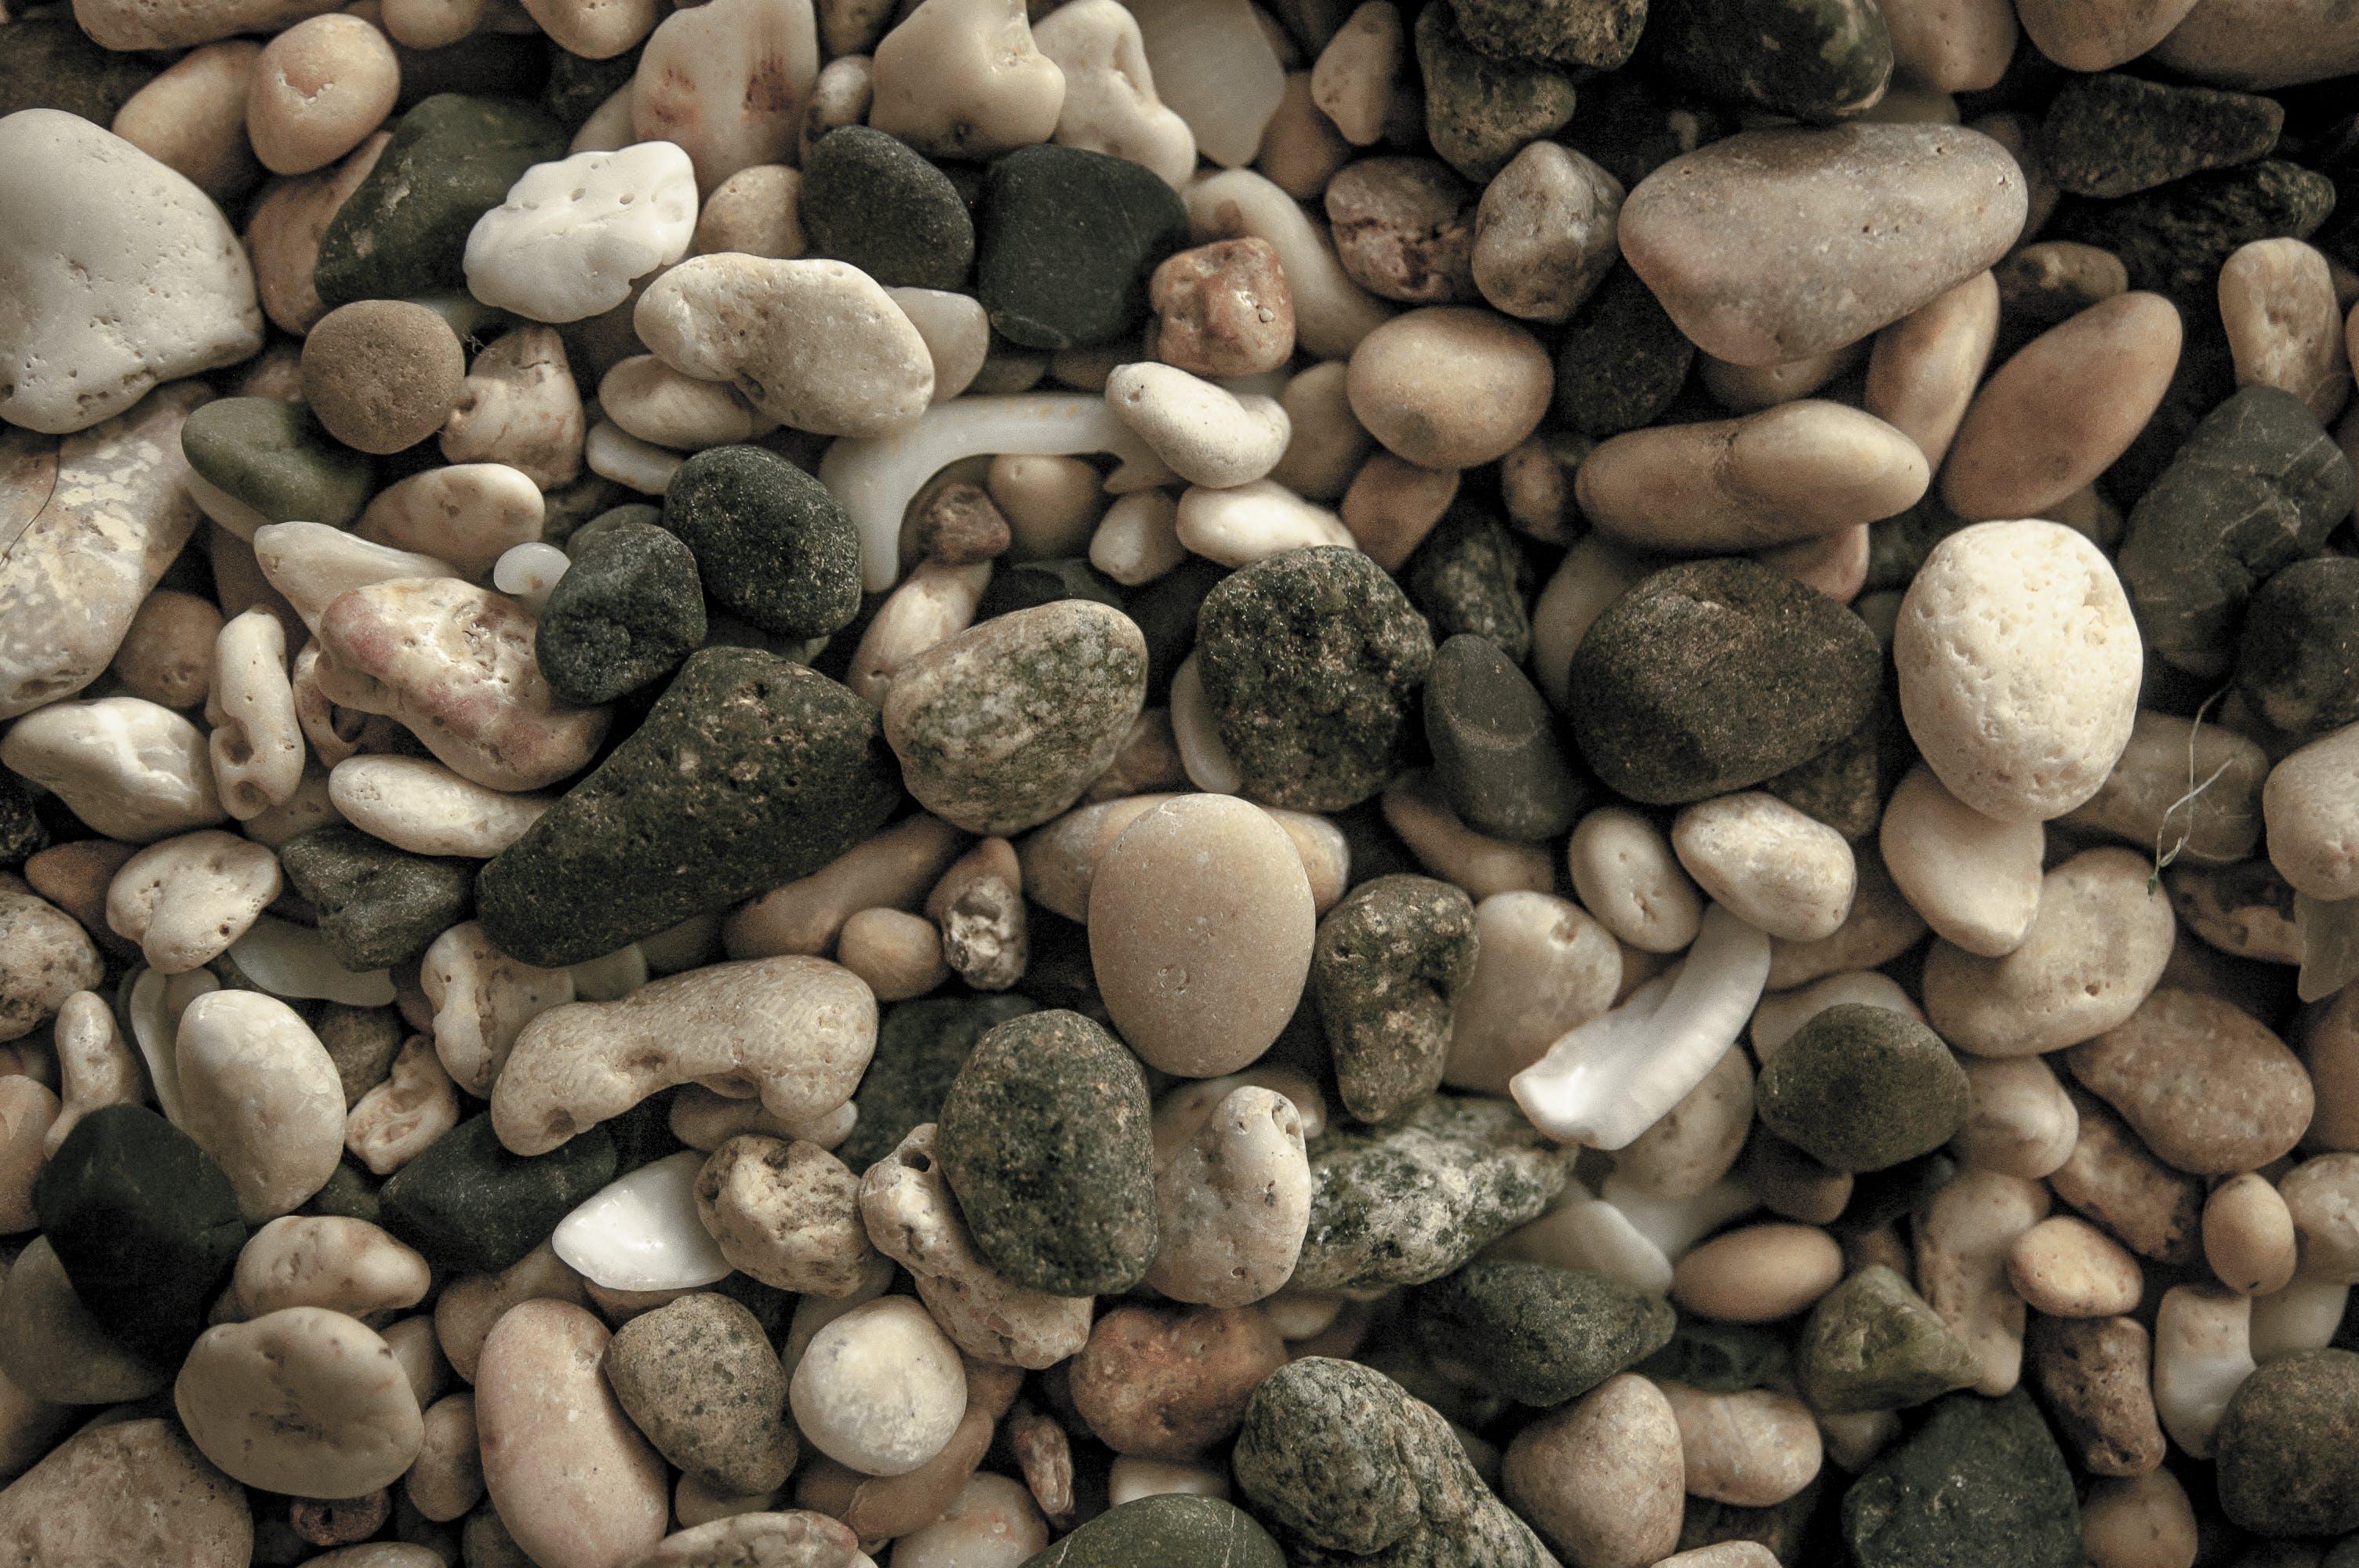 Free stock photo of Mossy rocks